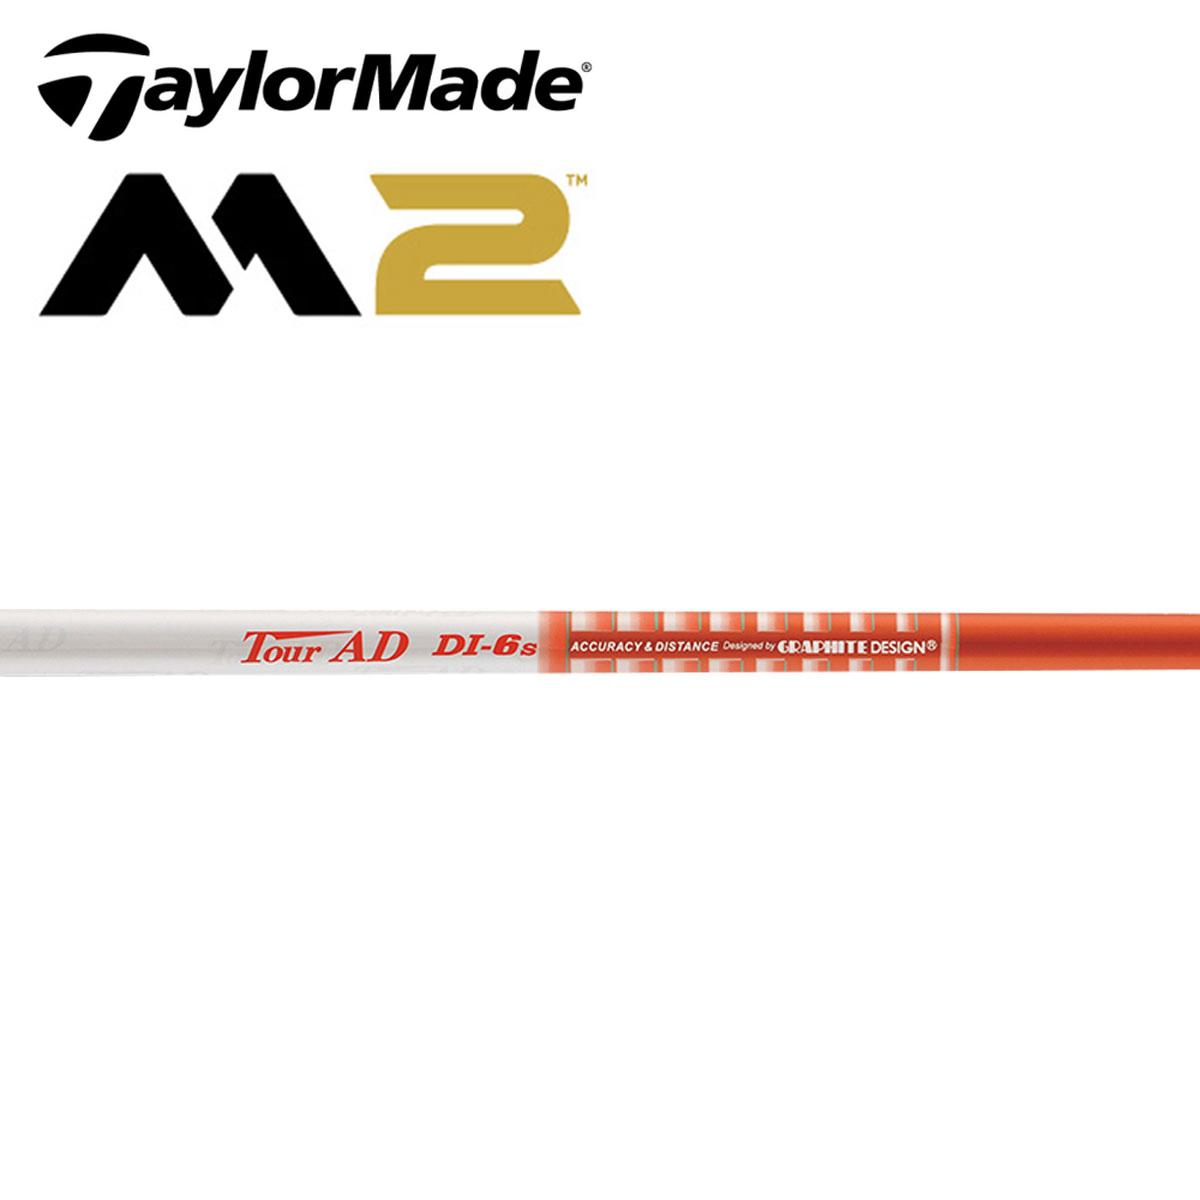 Tour AD DIシリーズ M2 ドライバーロフト10.5度用スリーブ付きシャフト 2016年モデル【テーラーメイド専用】